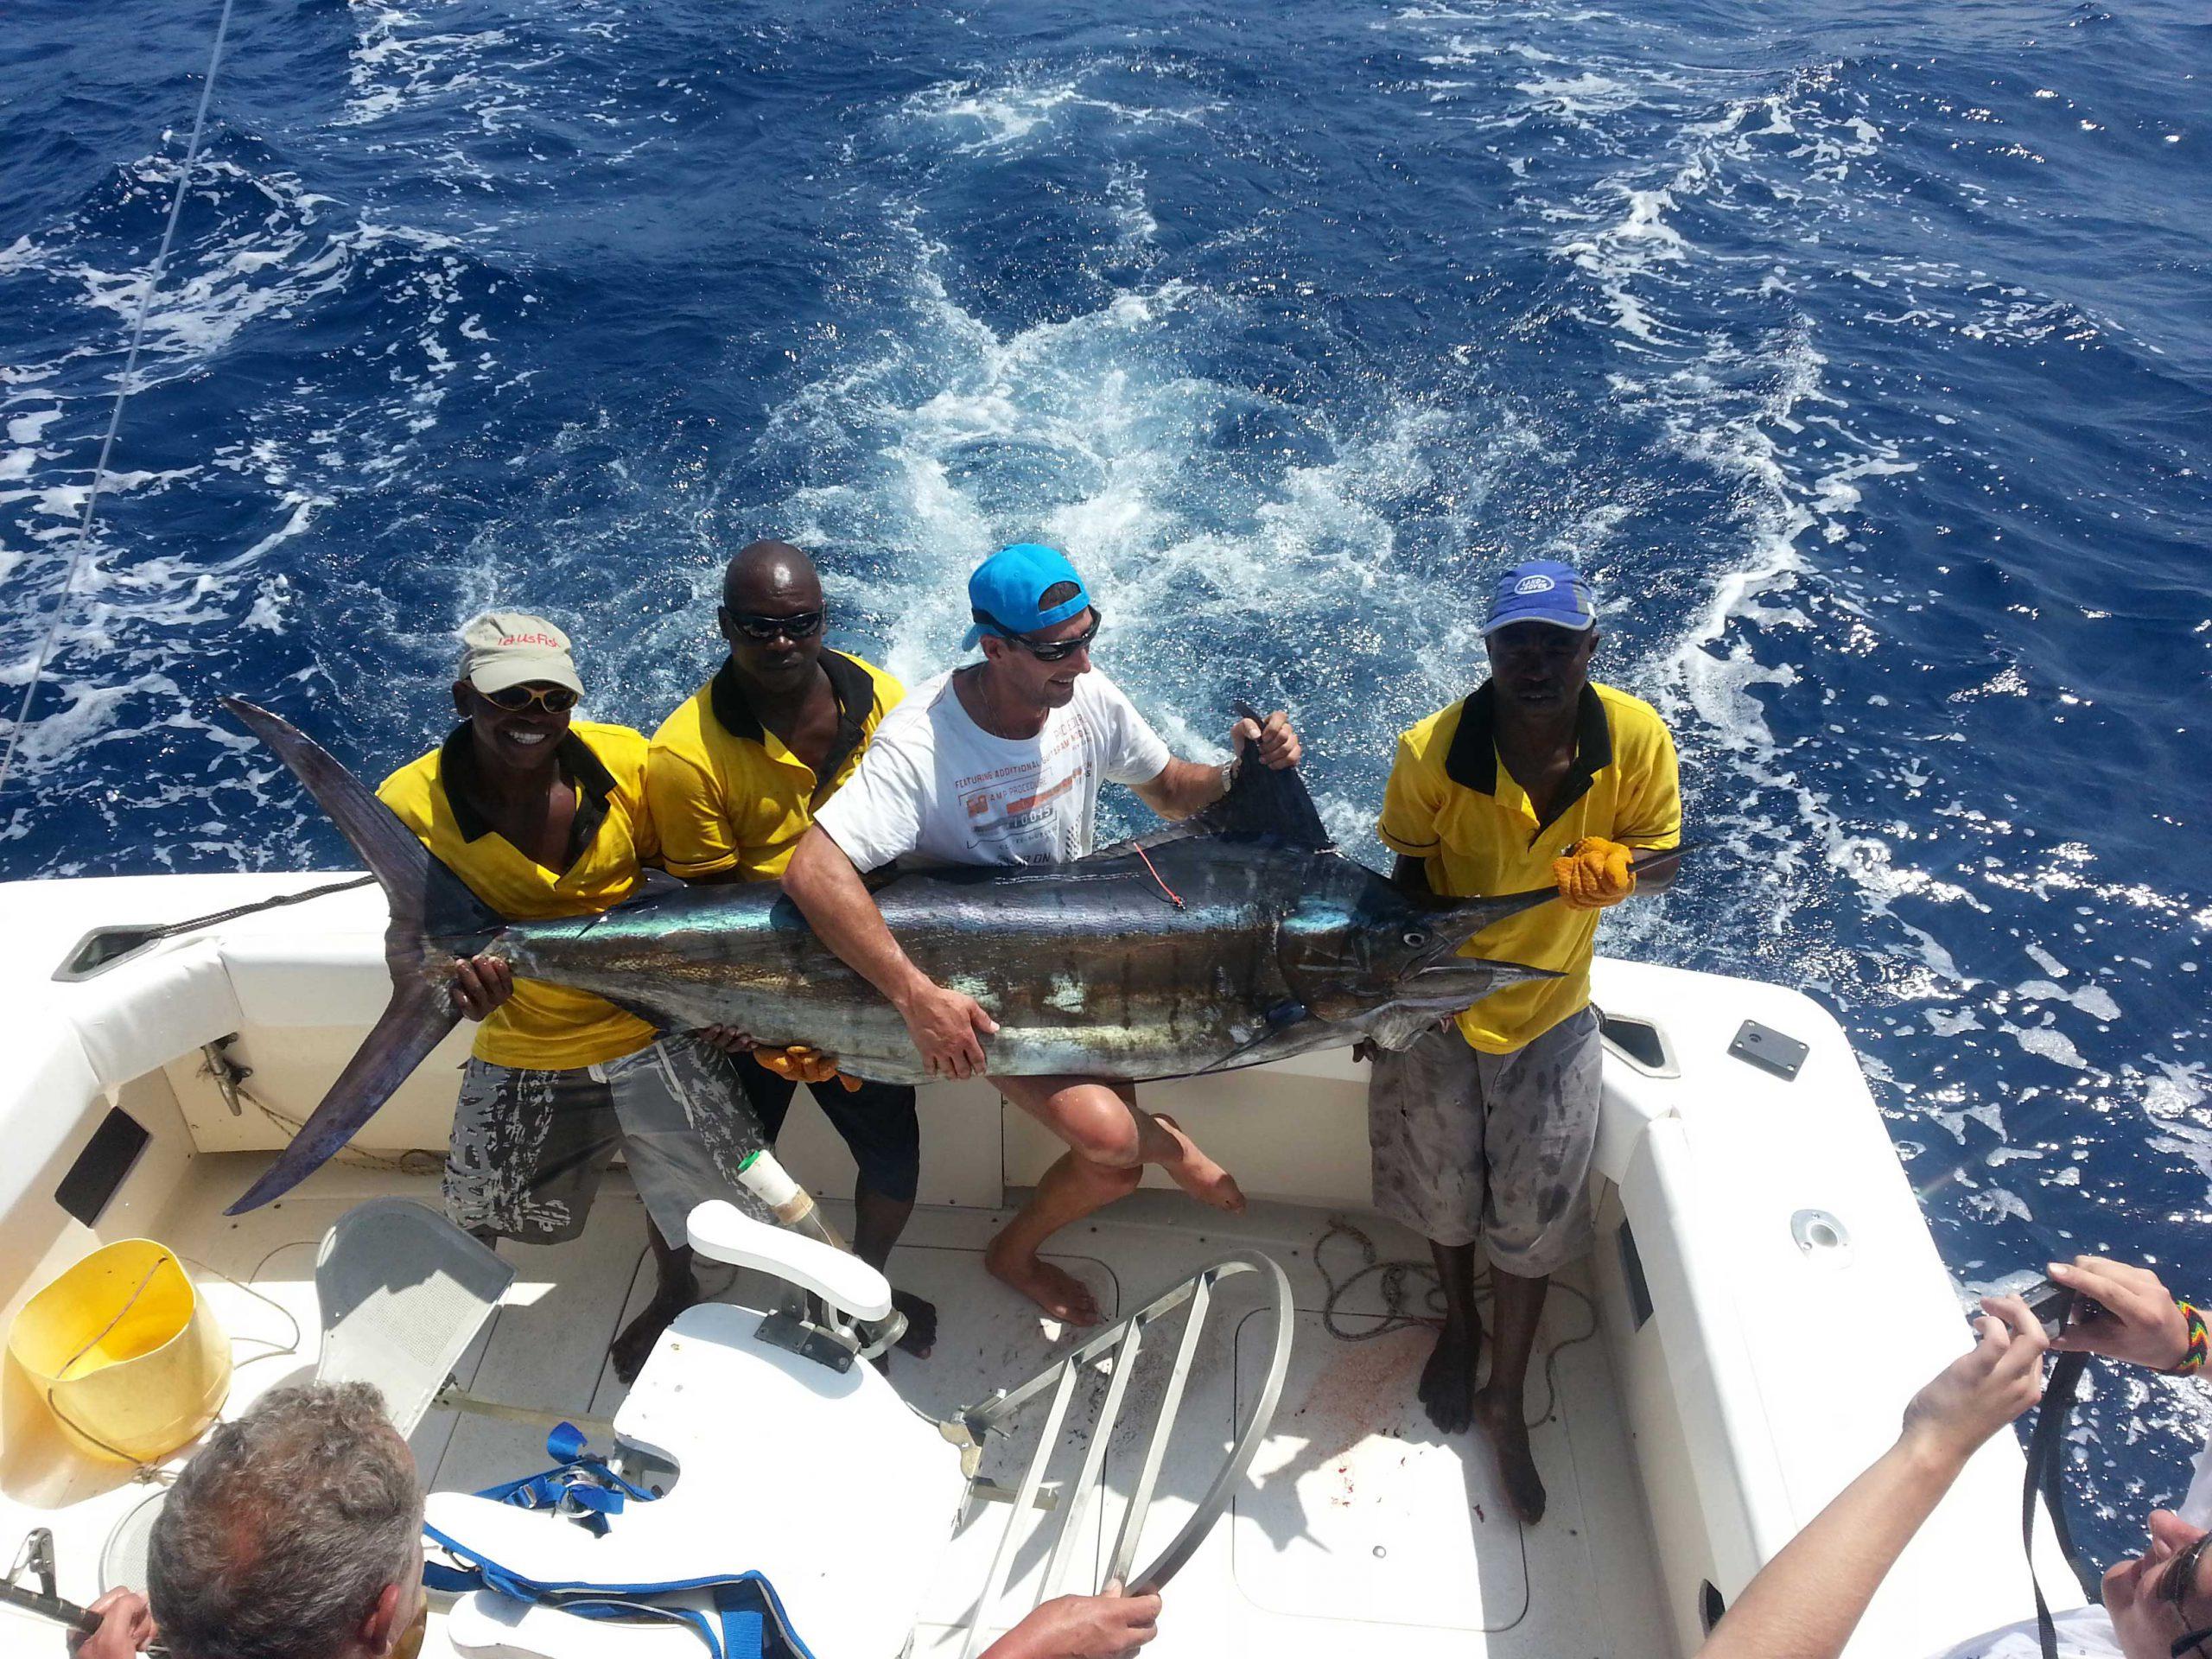 Big game fishing cacth in Kenya- Marlin